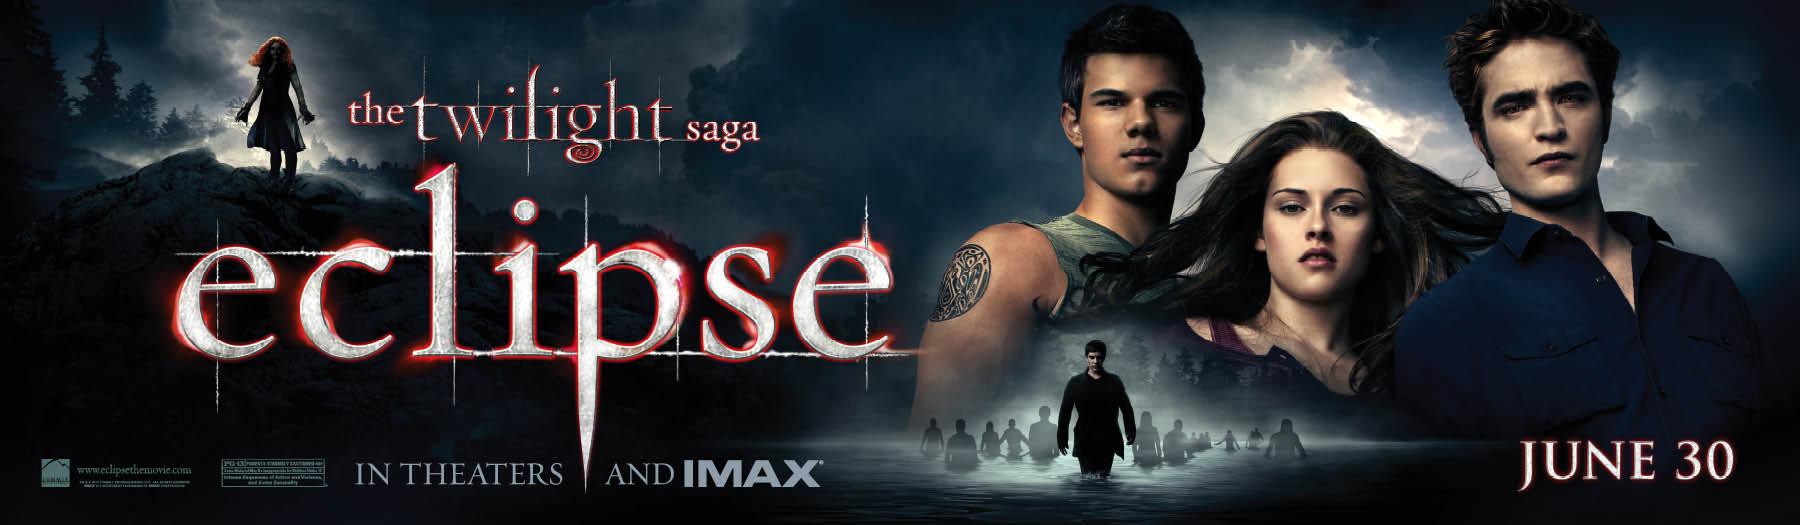 Image Result For Movies Wilight Saga